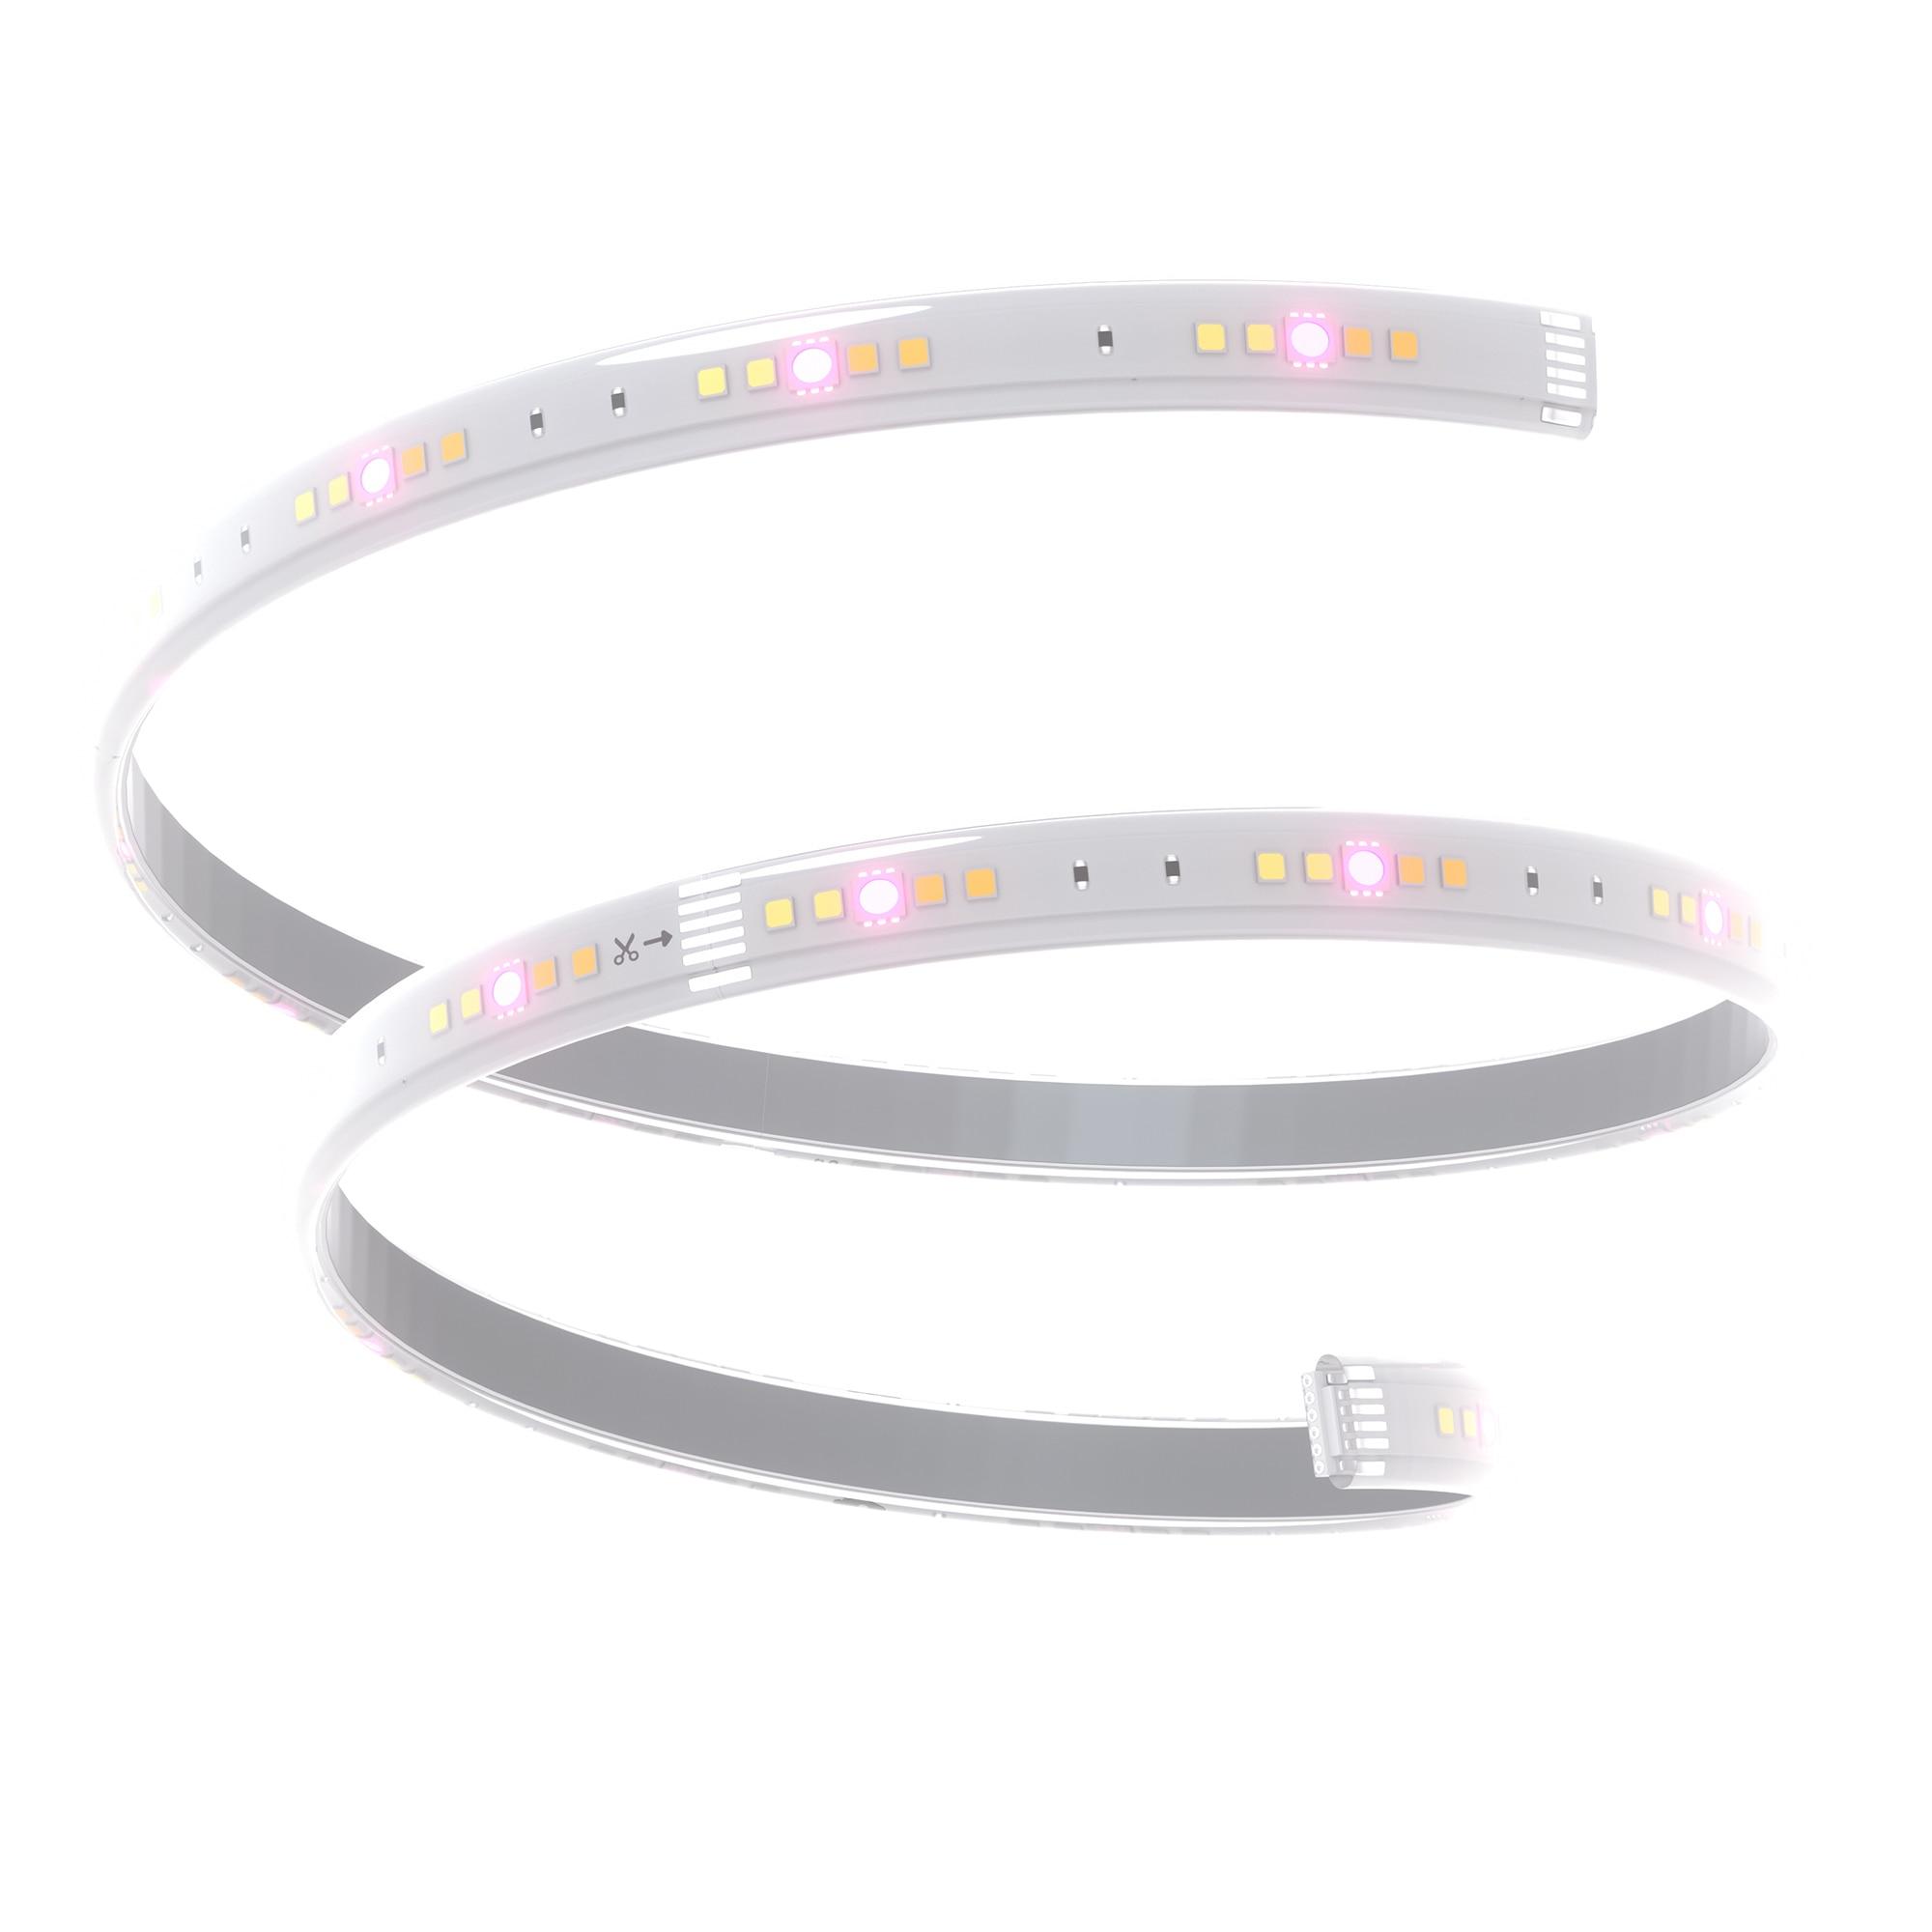 Fotografie Extensie banda LED inteligenta Nanoleaf Essentials Light Strips Expansion, 30W, 2000 lm, lumina alba si colorata, 1 m